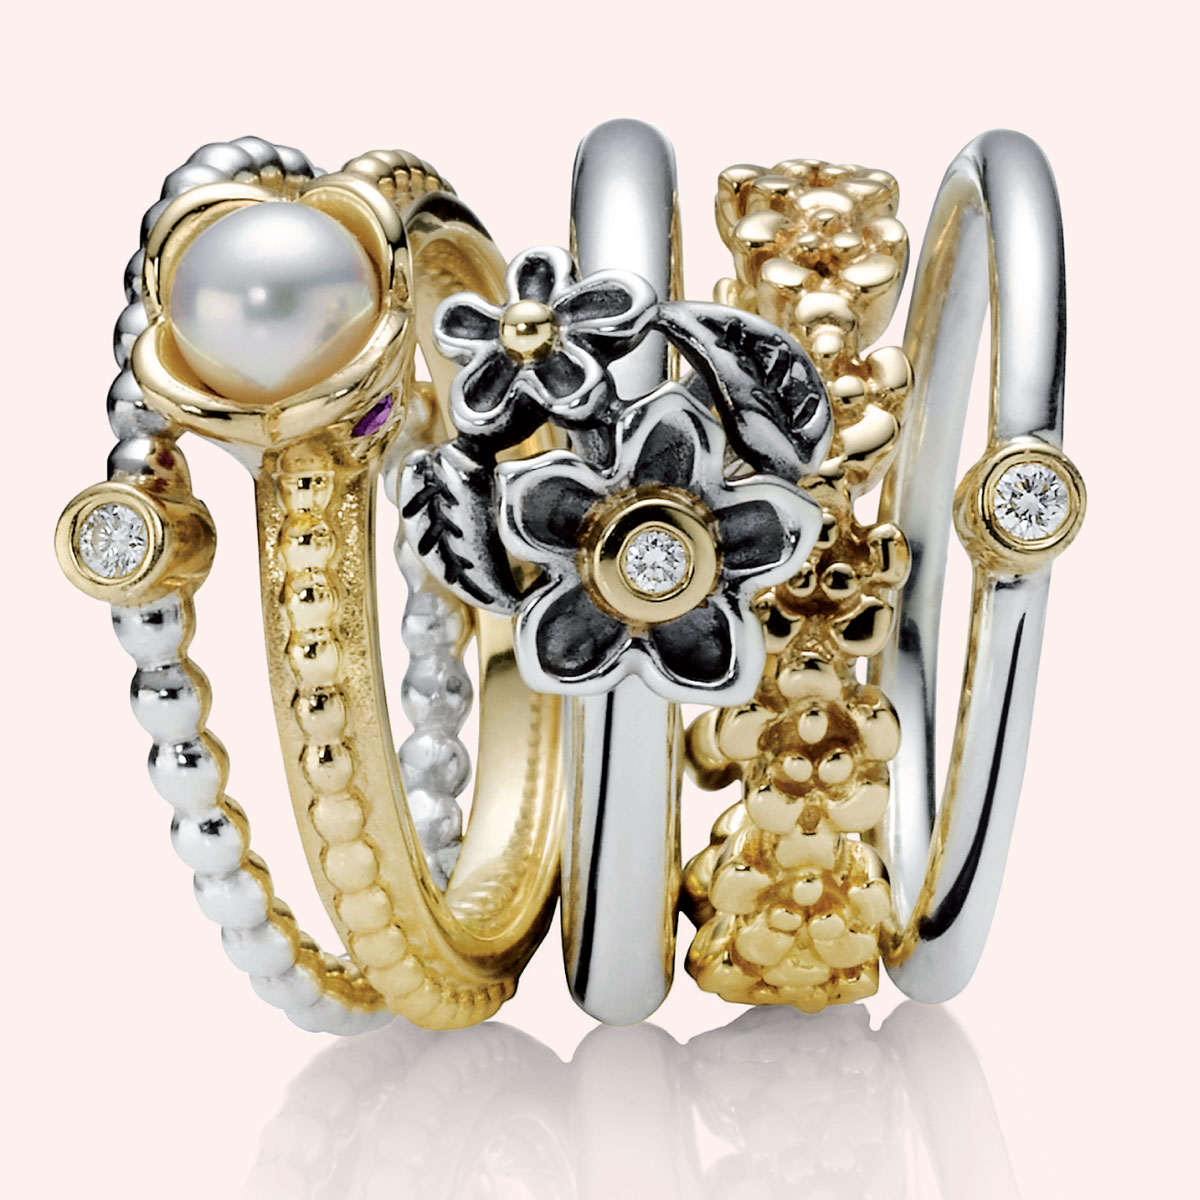 694bb74bc PANDORA Evening Star with 14K & Diamond Stackable Ring -  Pancharmbracelets.com